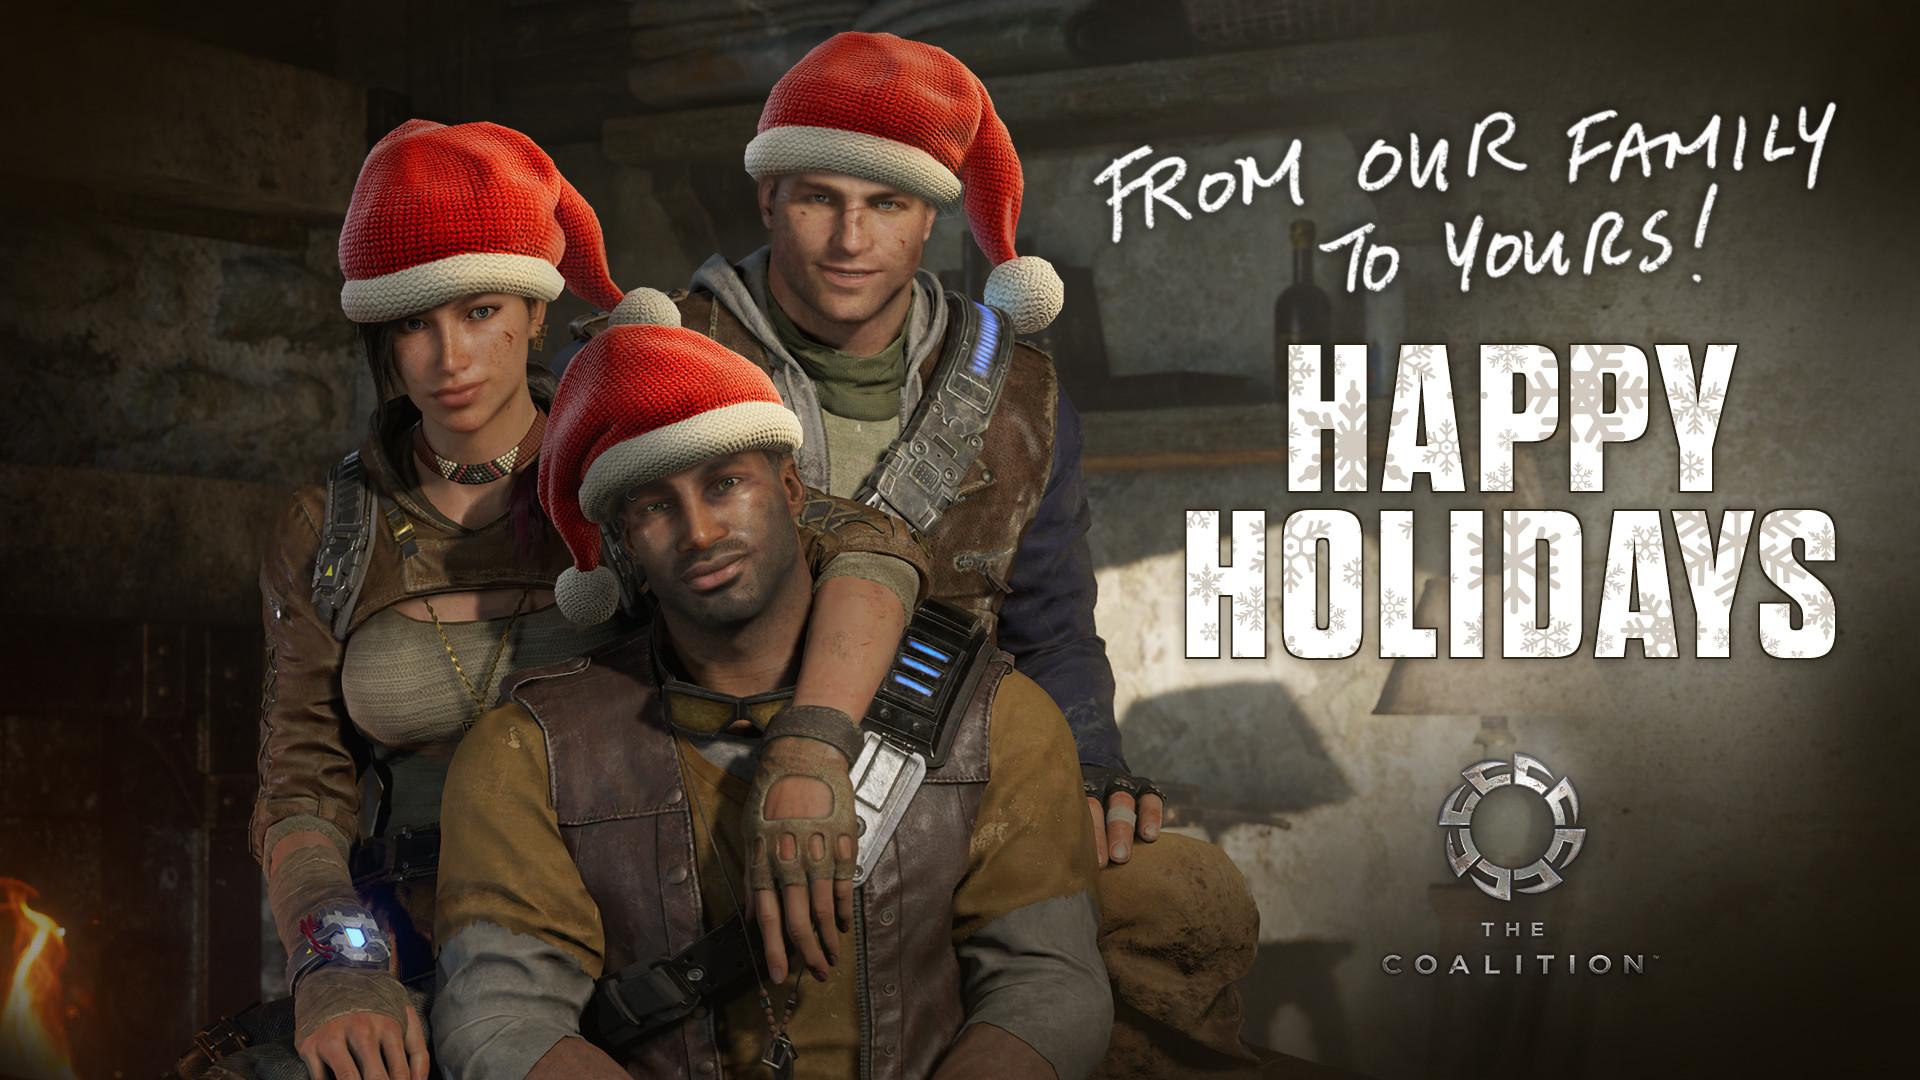 Haiwei hou happyholidays santa hats 1920x1080 1